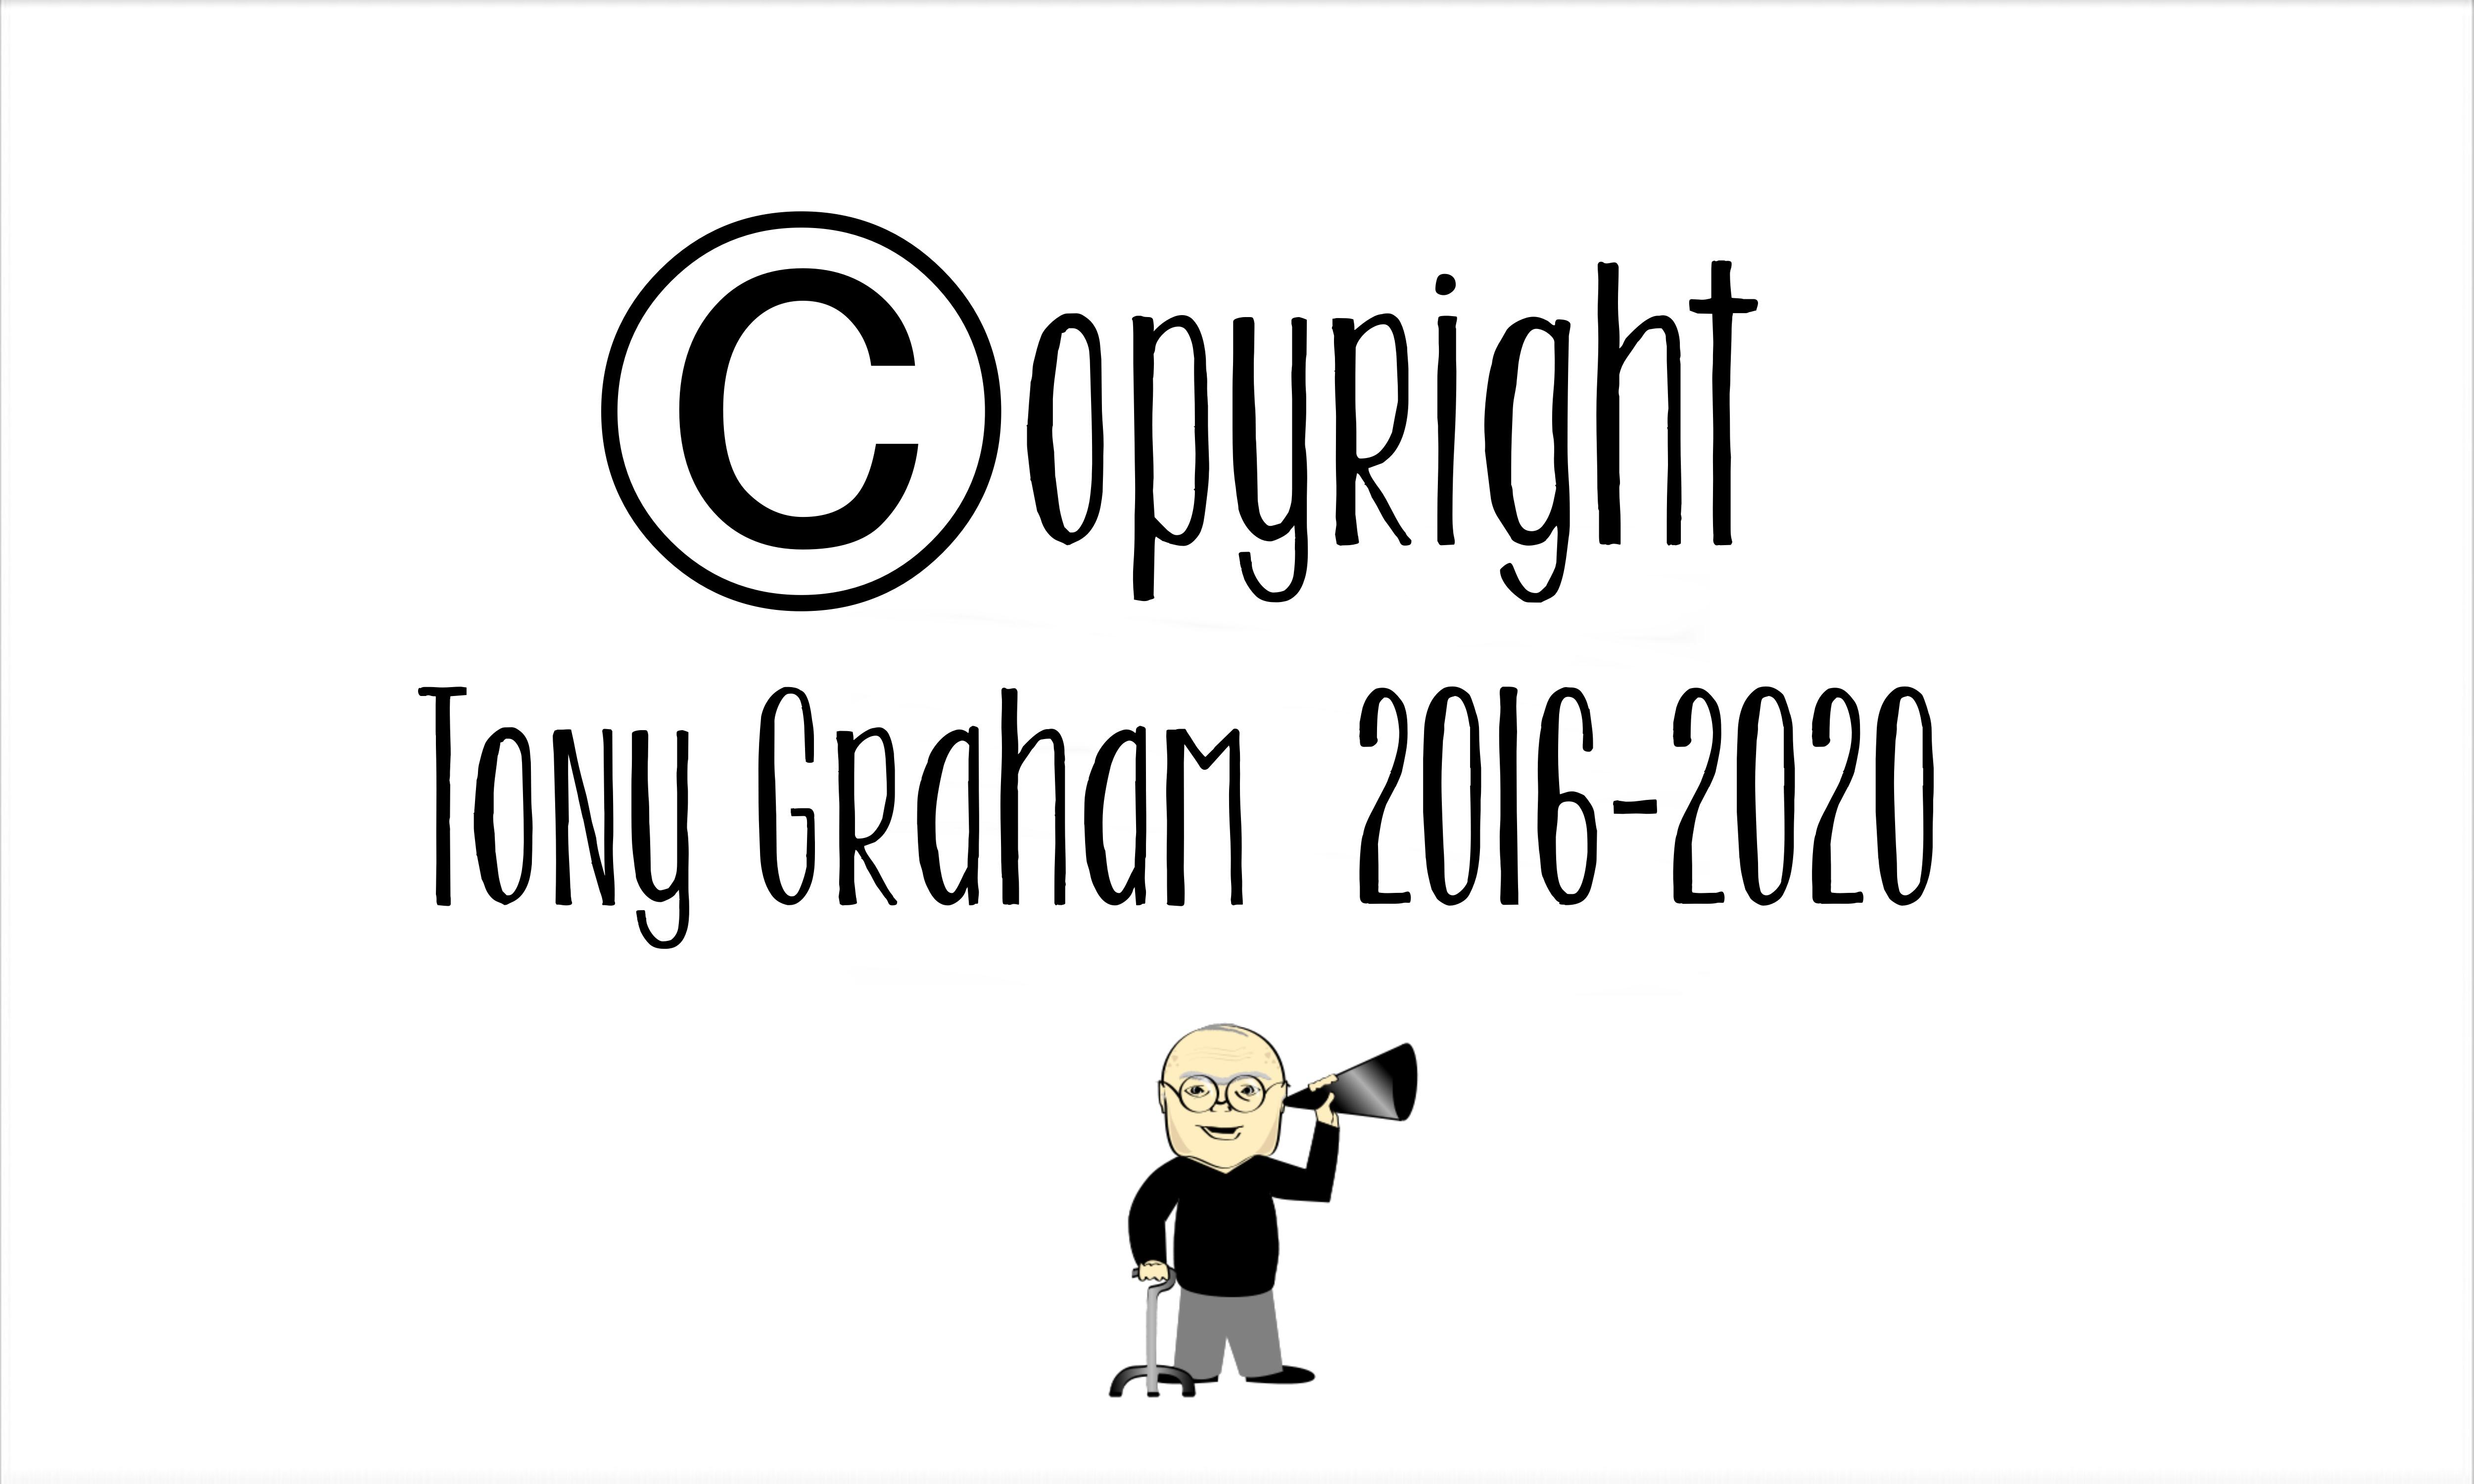 TOOTG Copyright 2016-2020 01